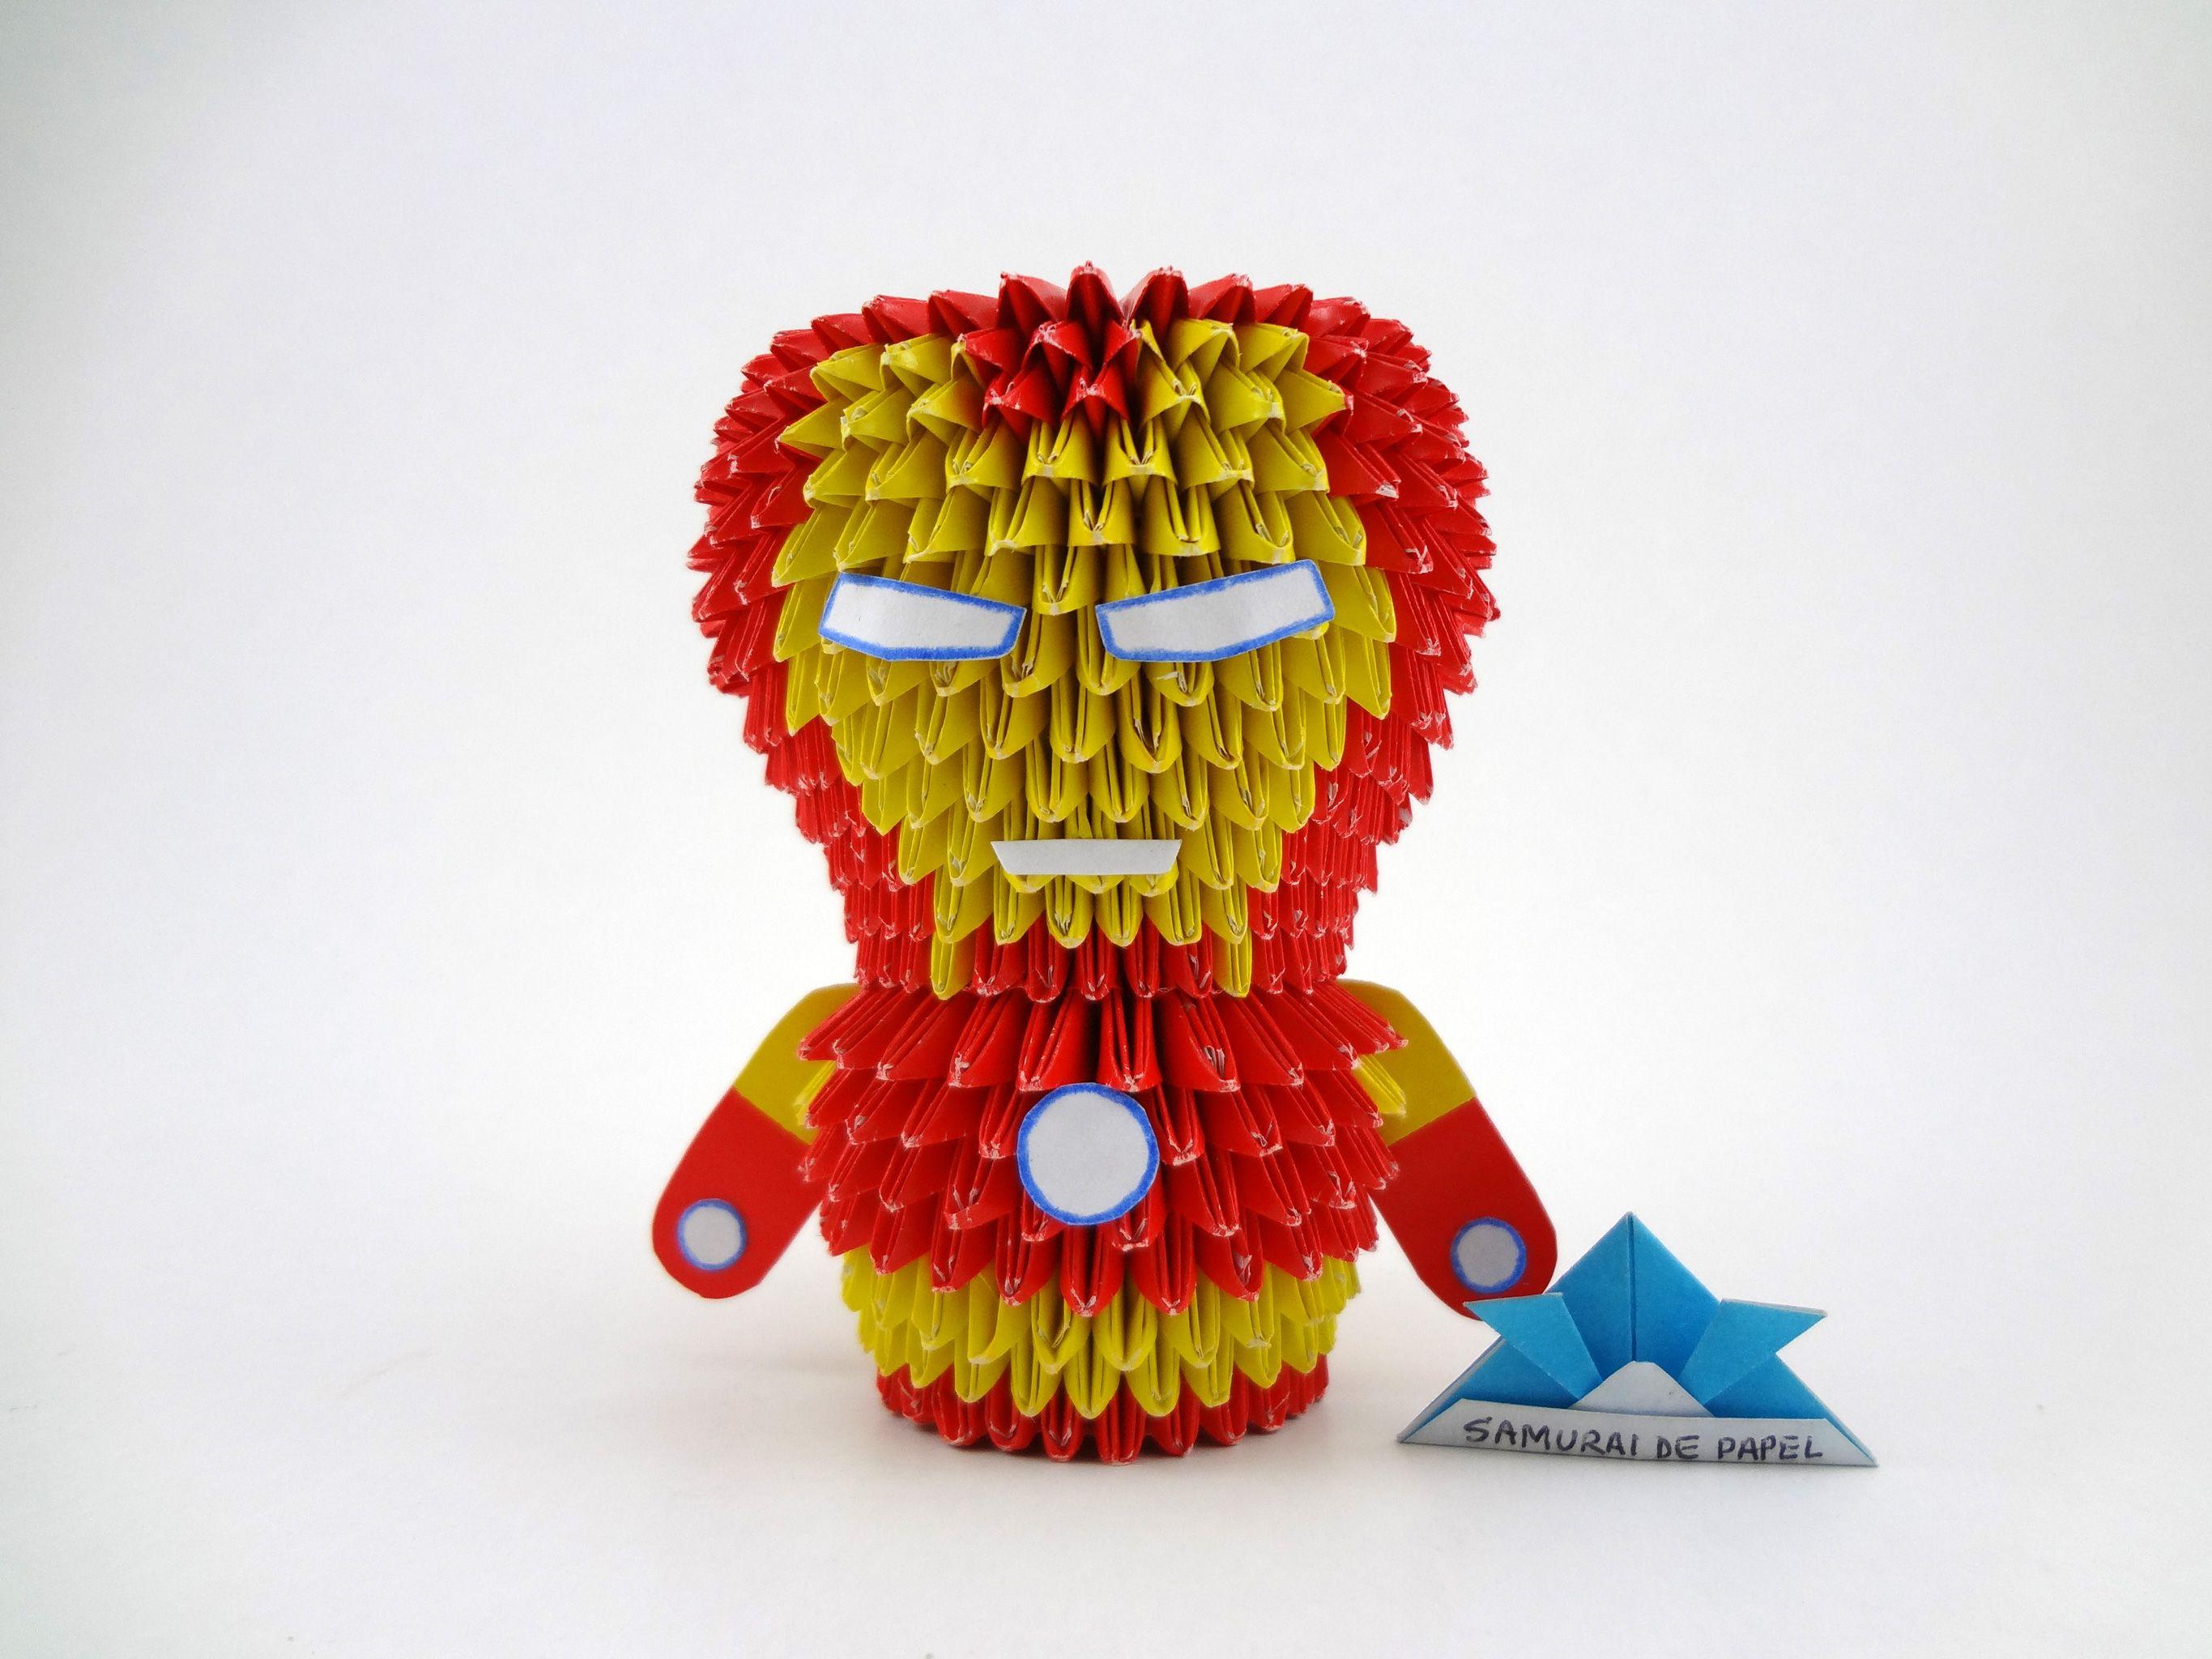 Origami 3d Iron Man The Avengers Arte De Origami Origami 3d Origami Modular